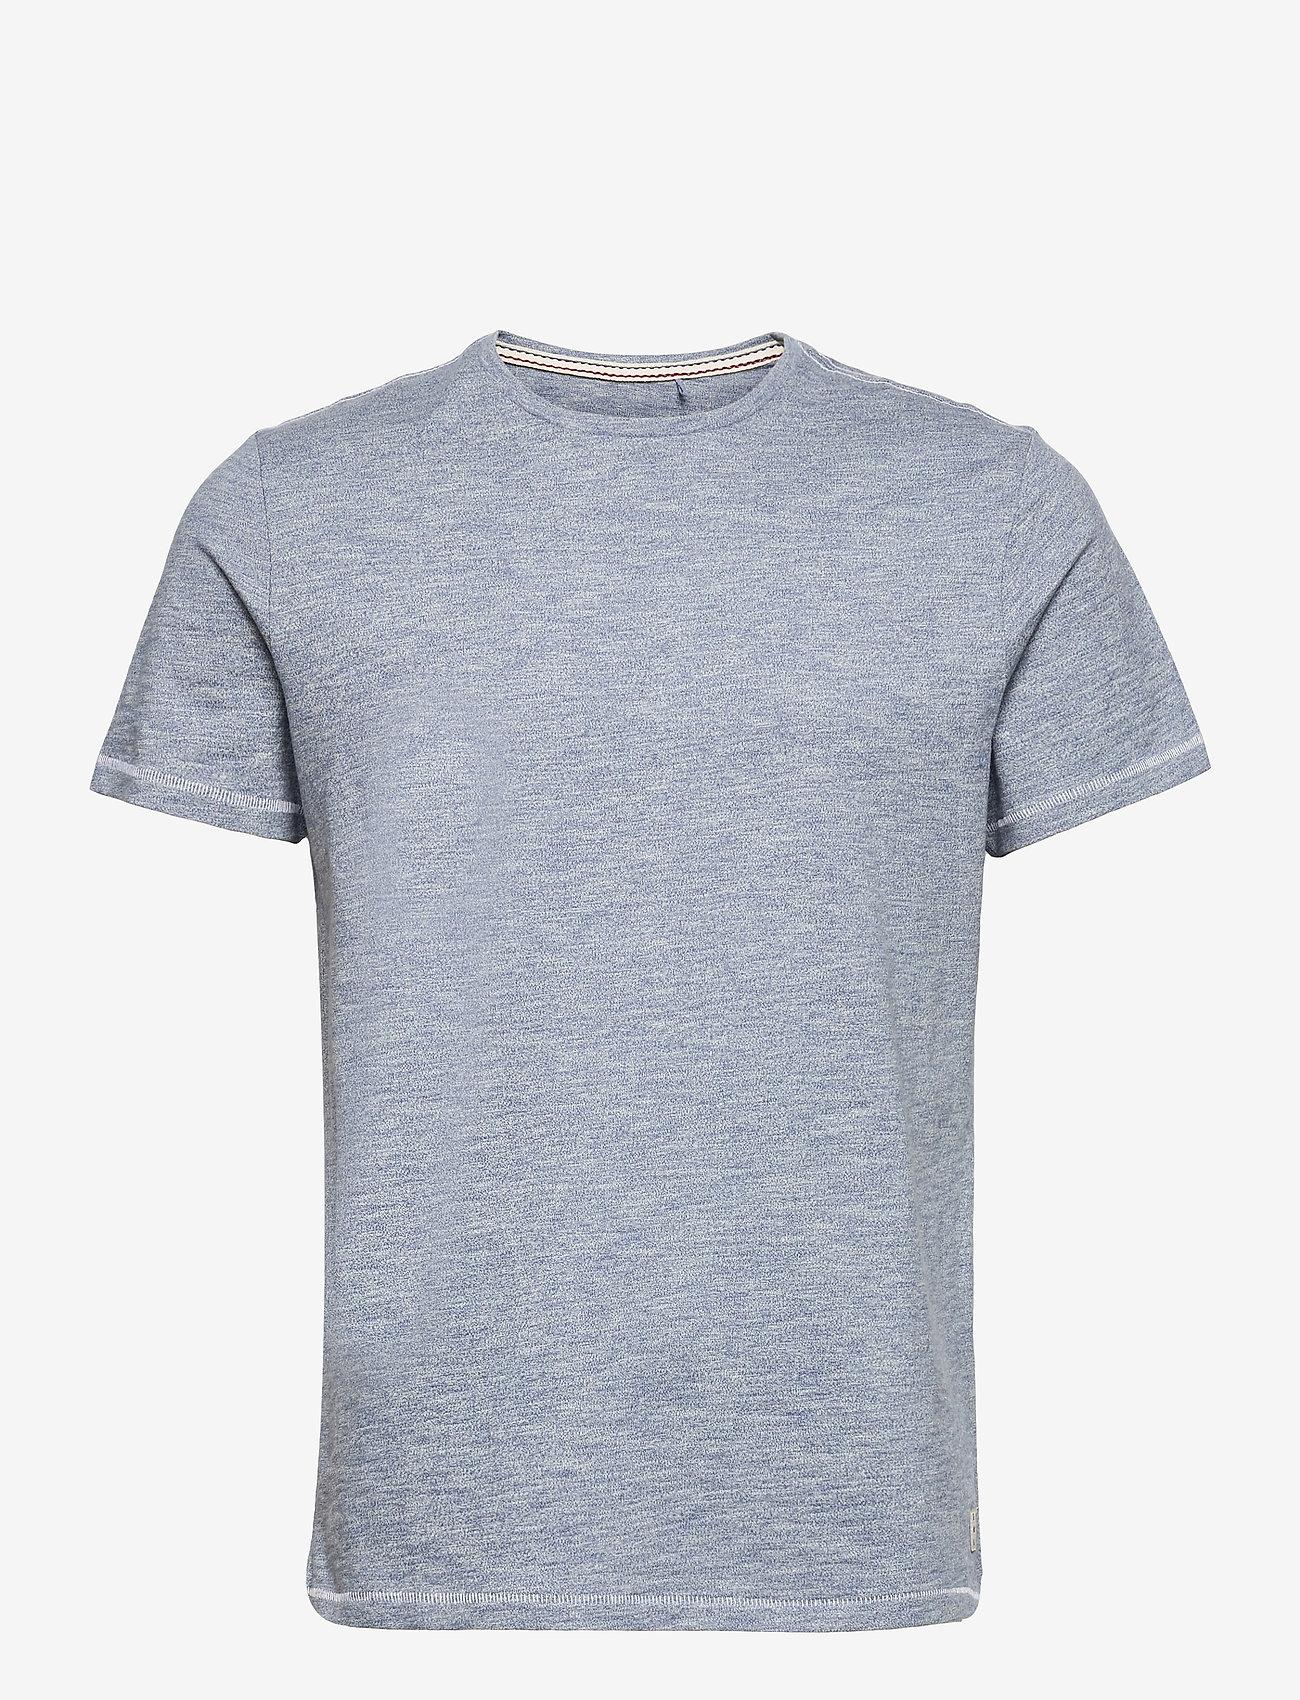 Blend - Tee - basic t-shirts - moonlight blue - 0